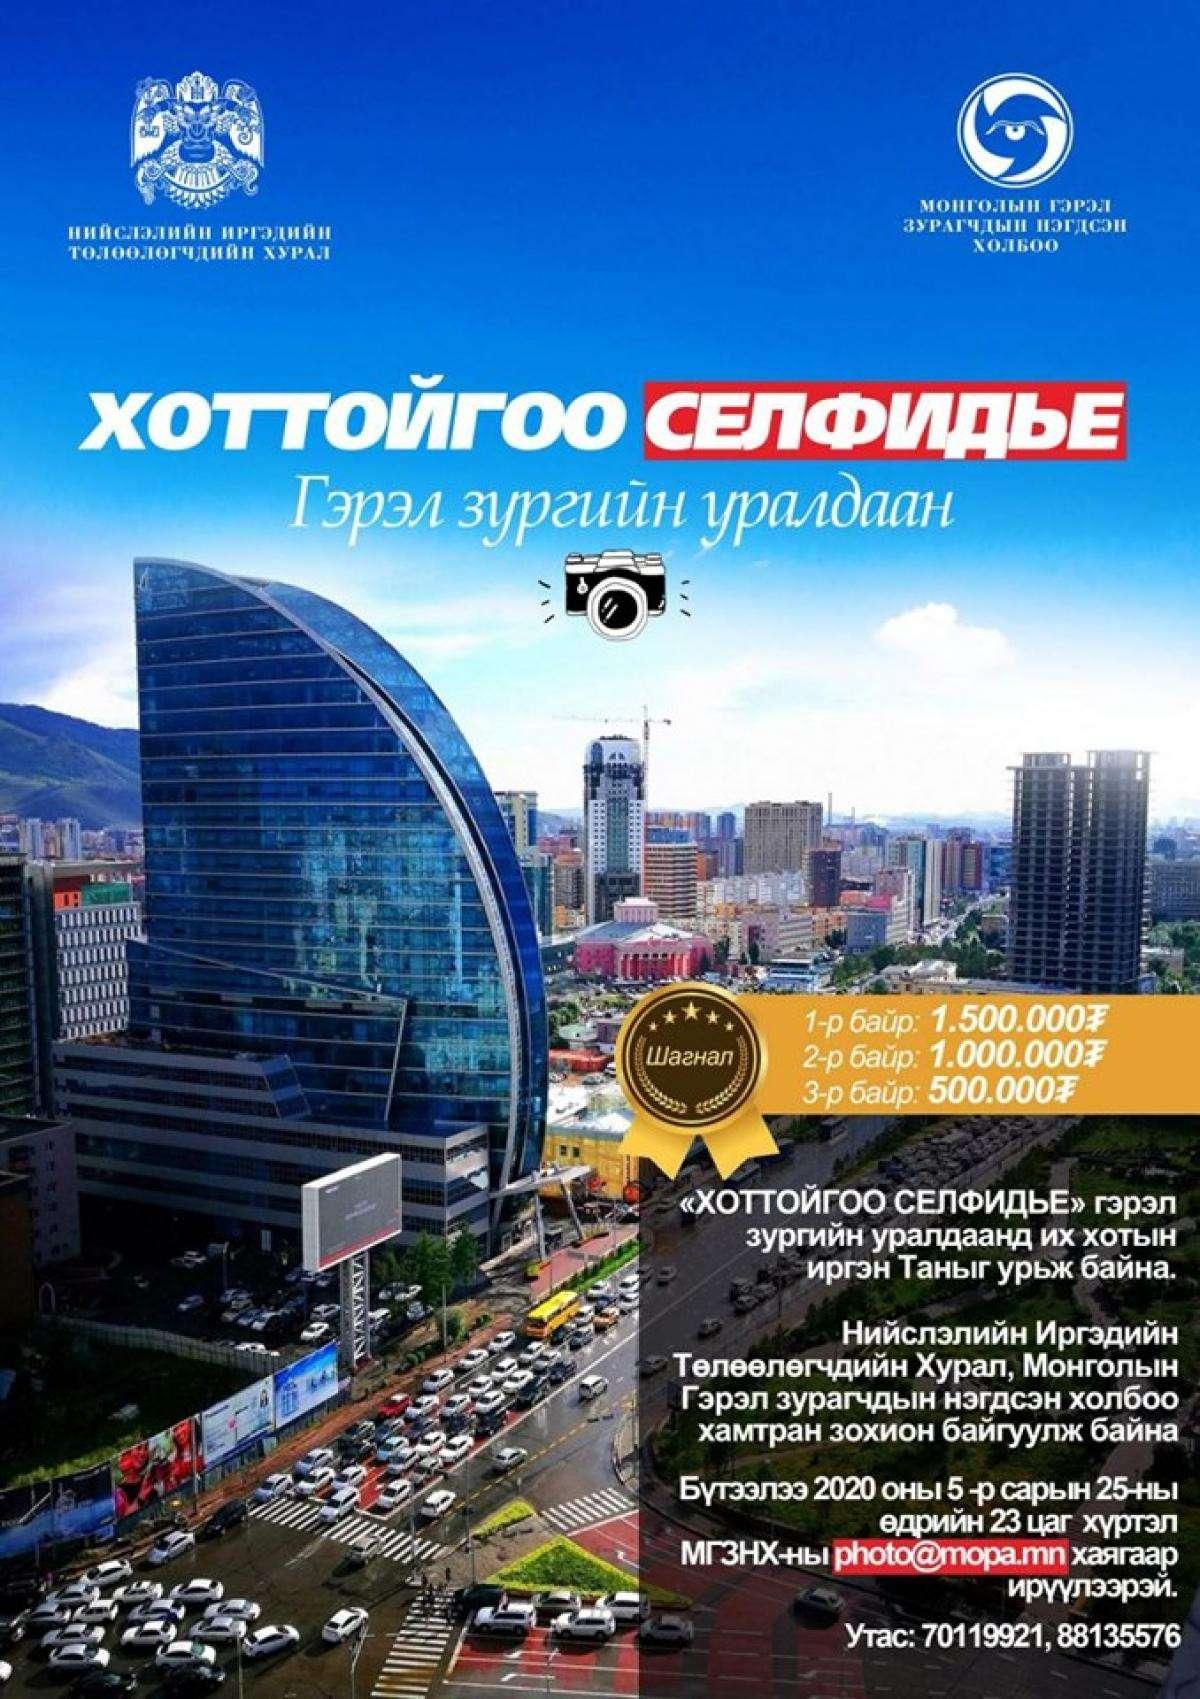 city-council-mn-img-15900363045-155809-1026384284.jpeg